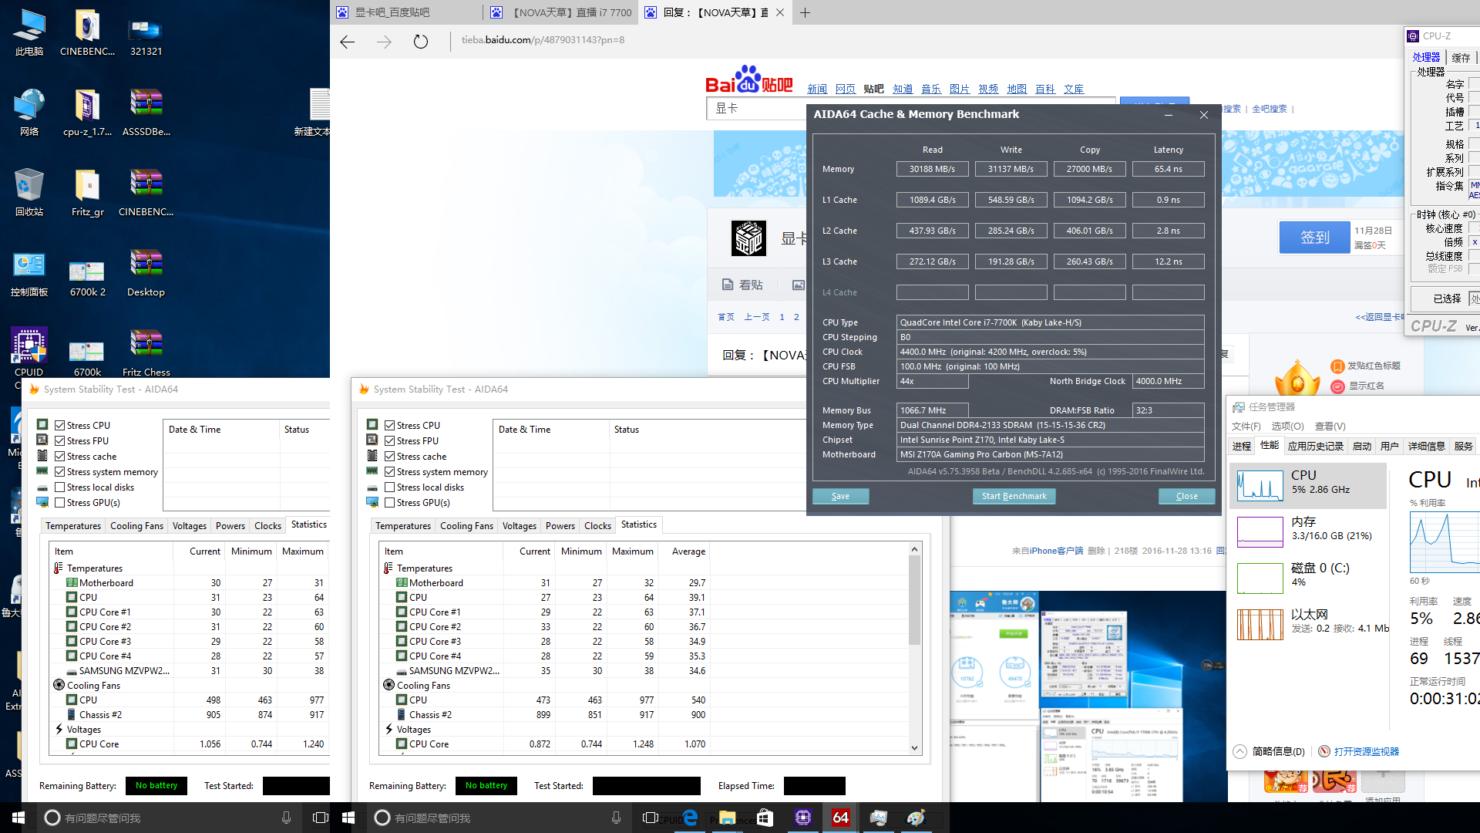 intel-core-i7-7700k-kaby-lake-benchmarks_aida64